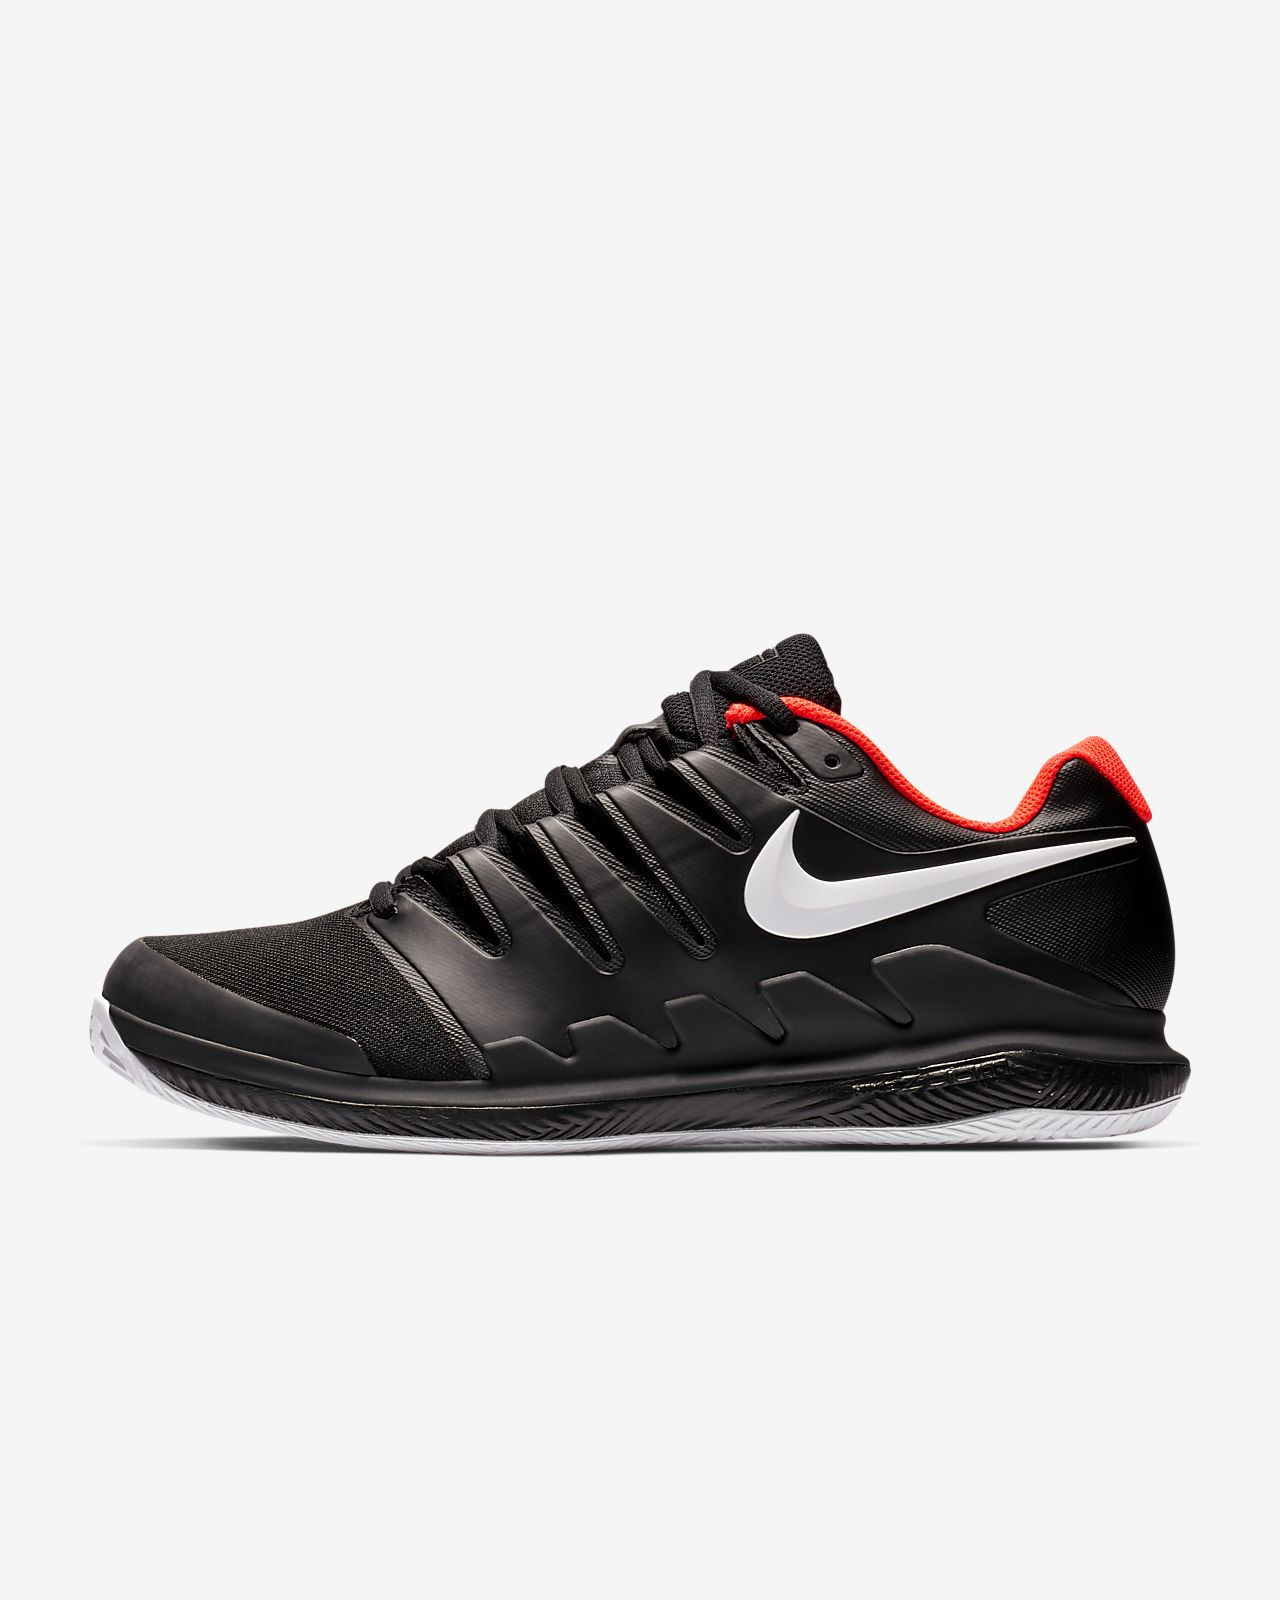 the best attitude f411a 6b810 Chaussure de tennis Nike Air Zoom Vapor X Clay pour Homme. Nike.com CA